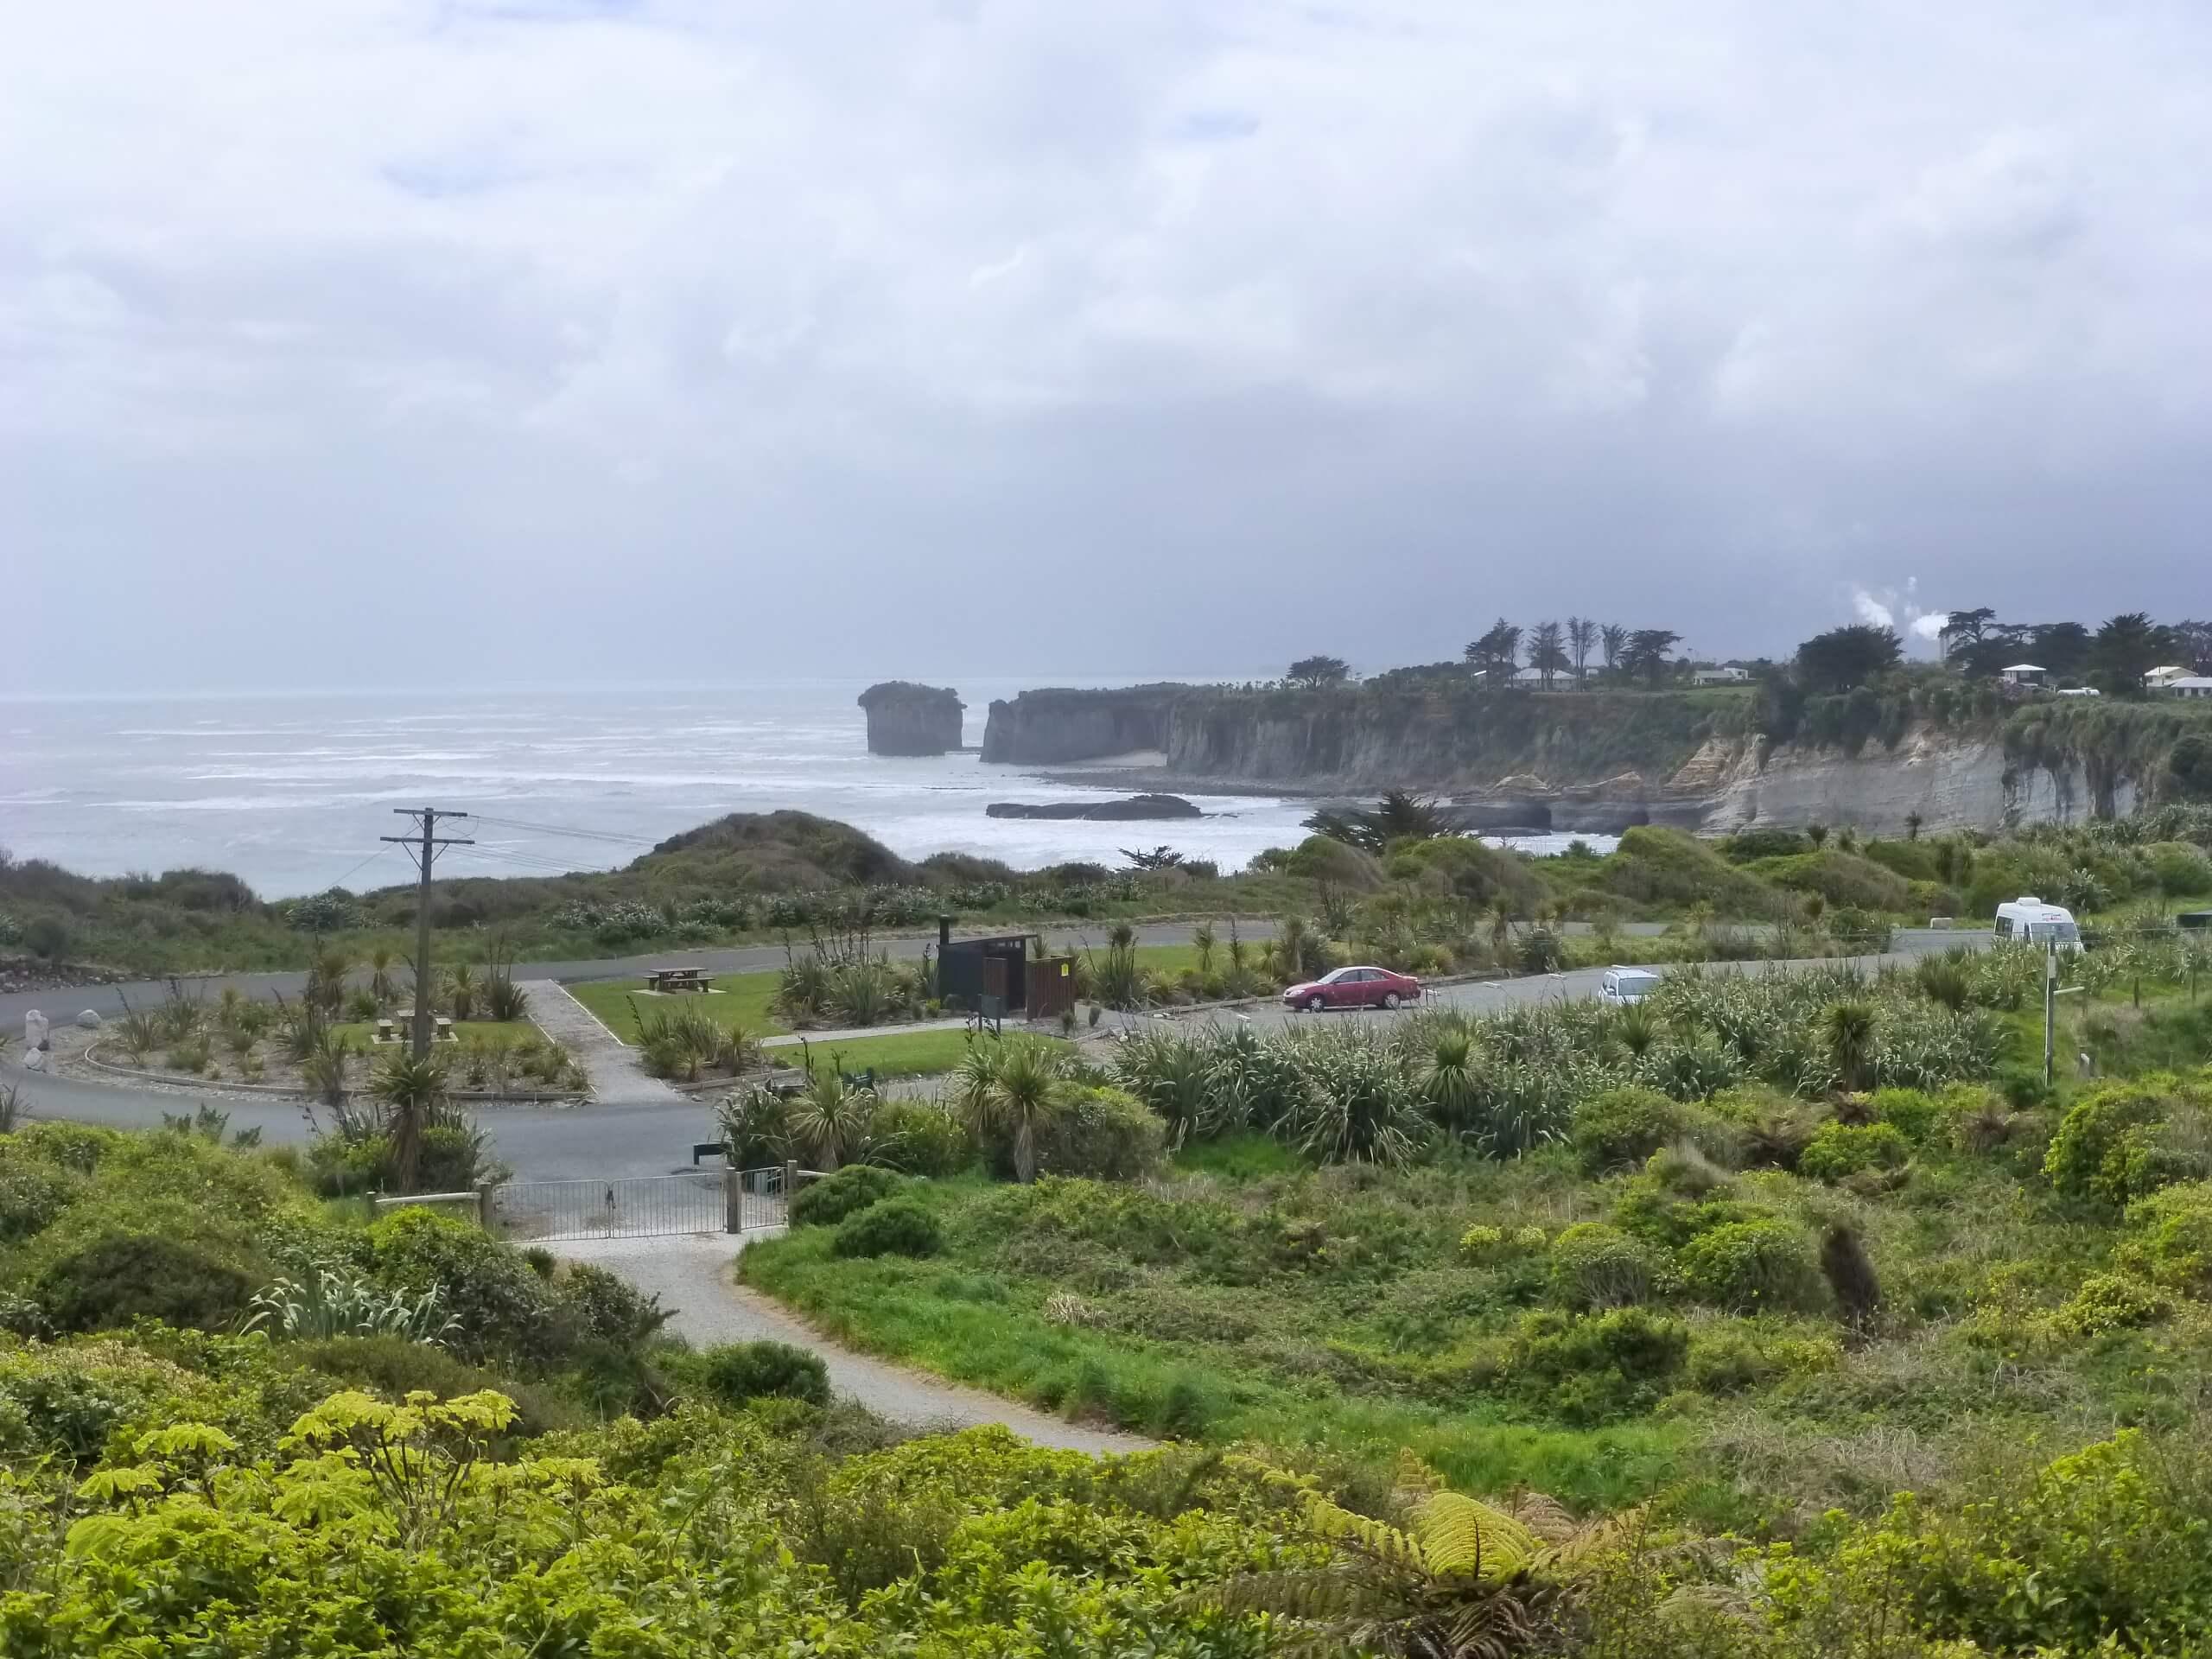 Cape Foulwind, NZ, Westküste 7